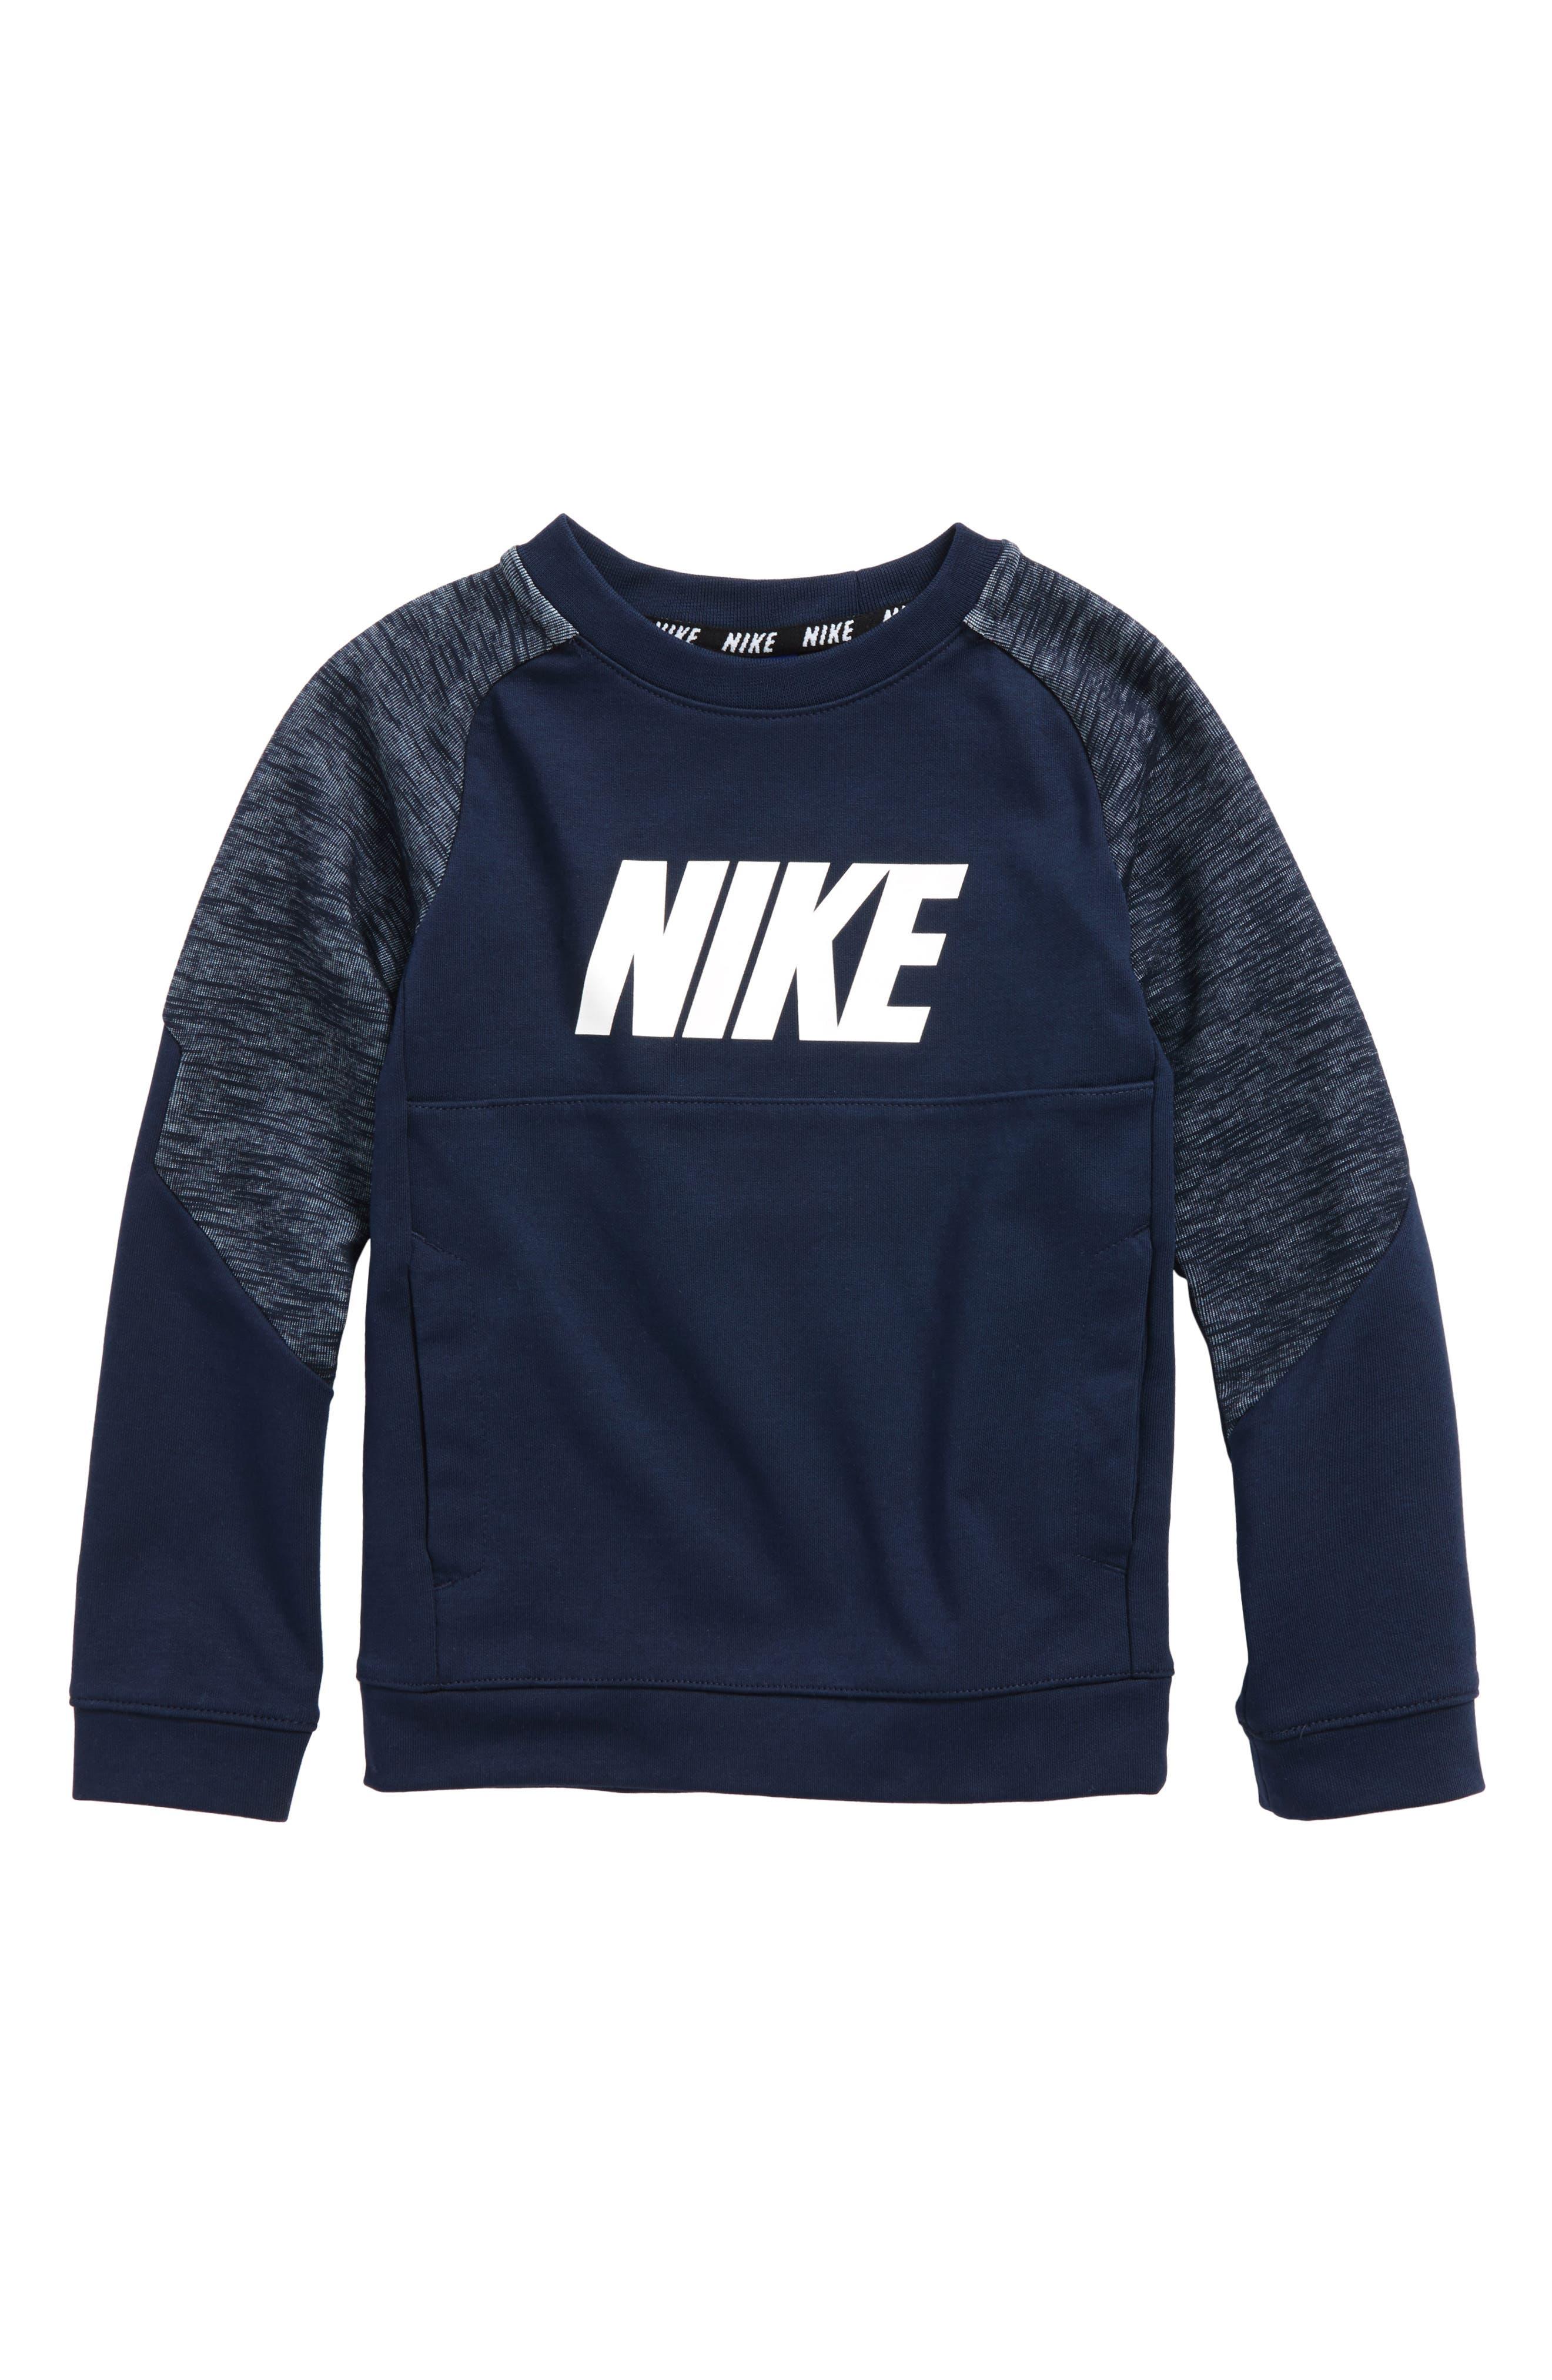 Main Image - Nike Raglan Sleeve Sweatshirt (Toddler Boys & Little Boys)